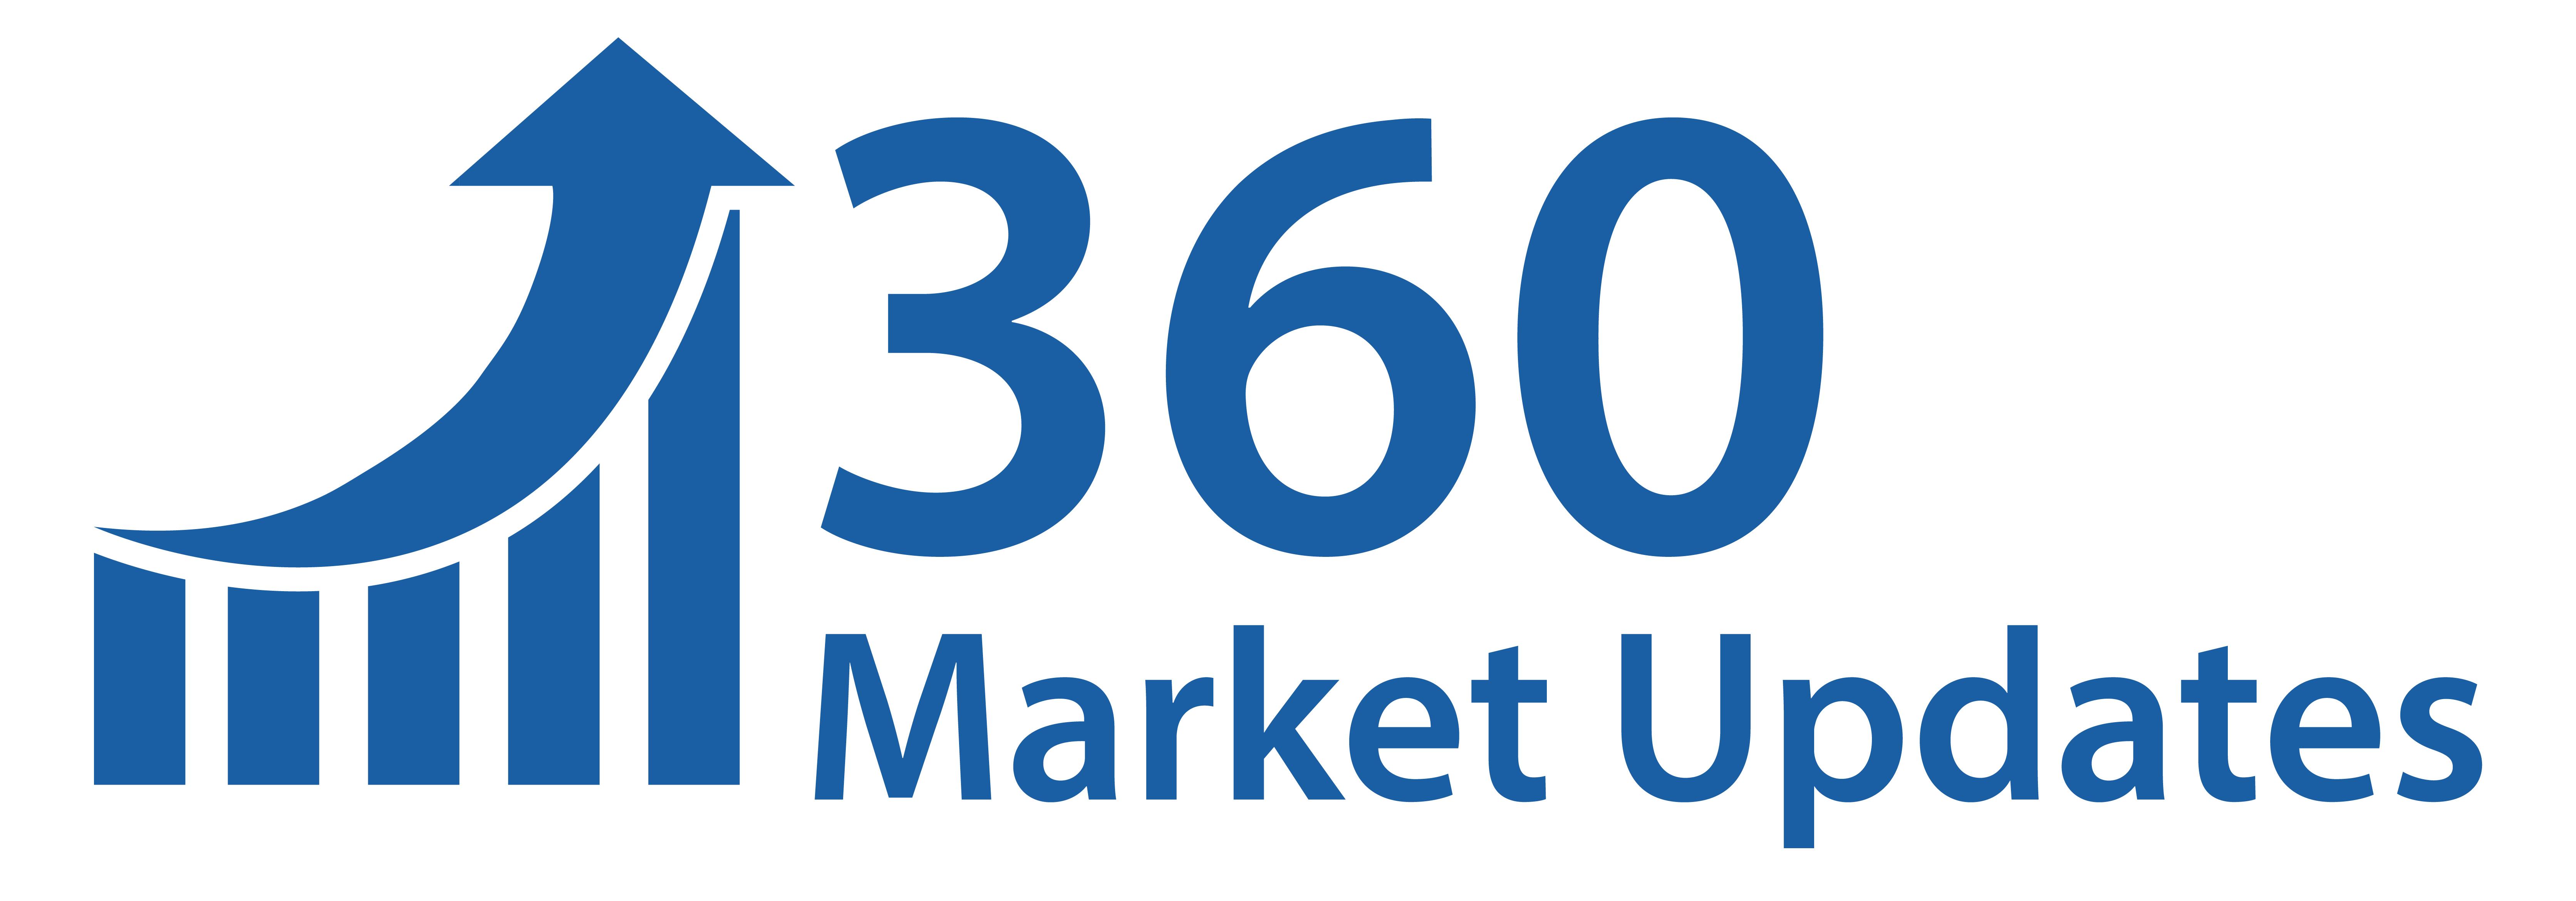 Global Benzaldehyde Market by Marketing Channel (Direct Marketing, Indirect Marketing), Products Sales, Revenue, Price and Gross Margin - Says 360marketupdates.com